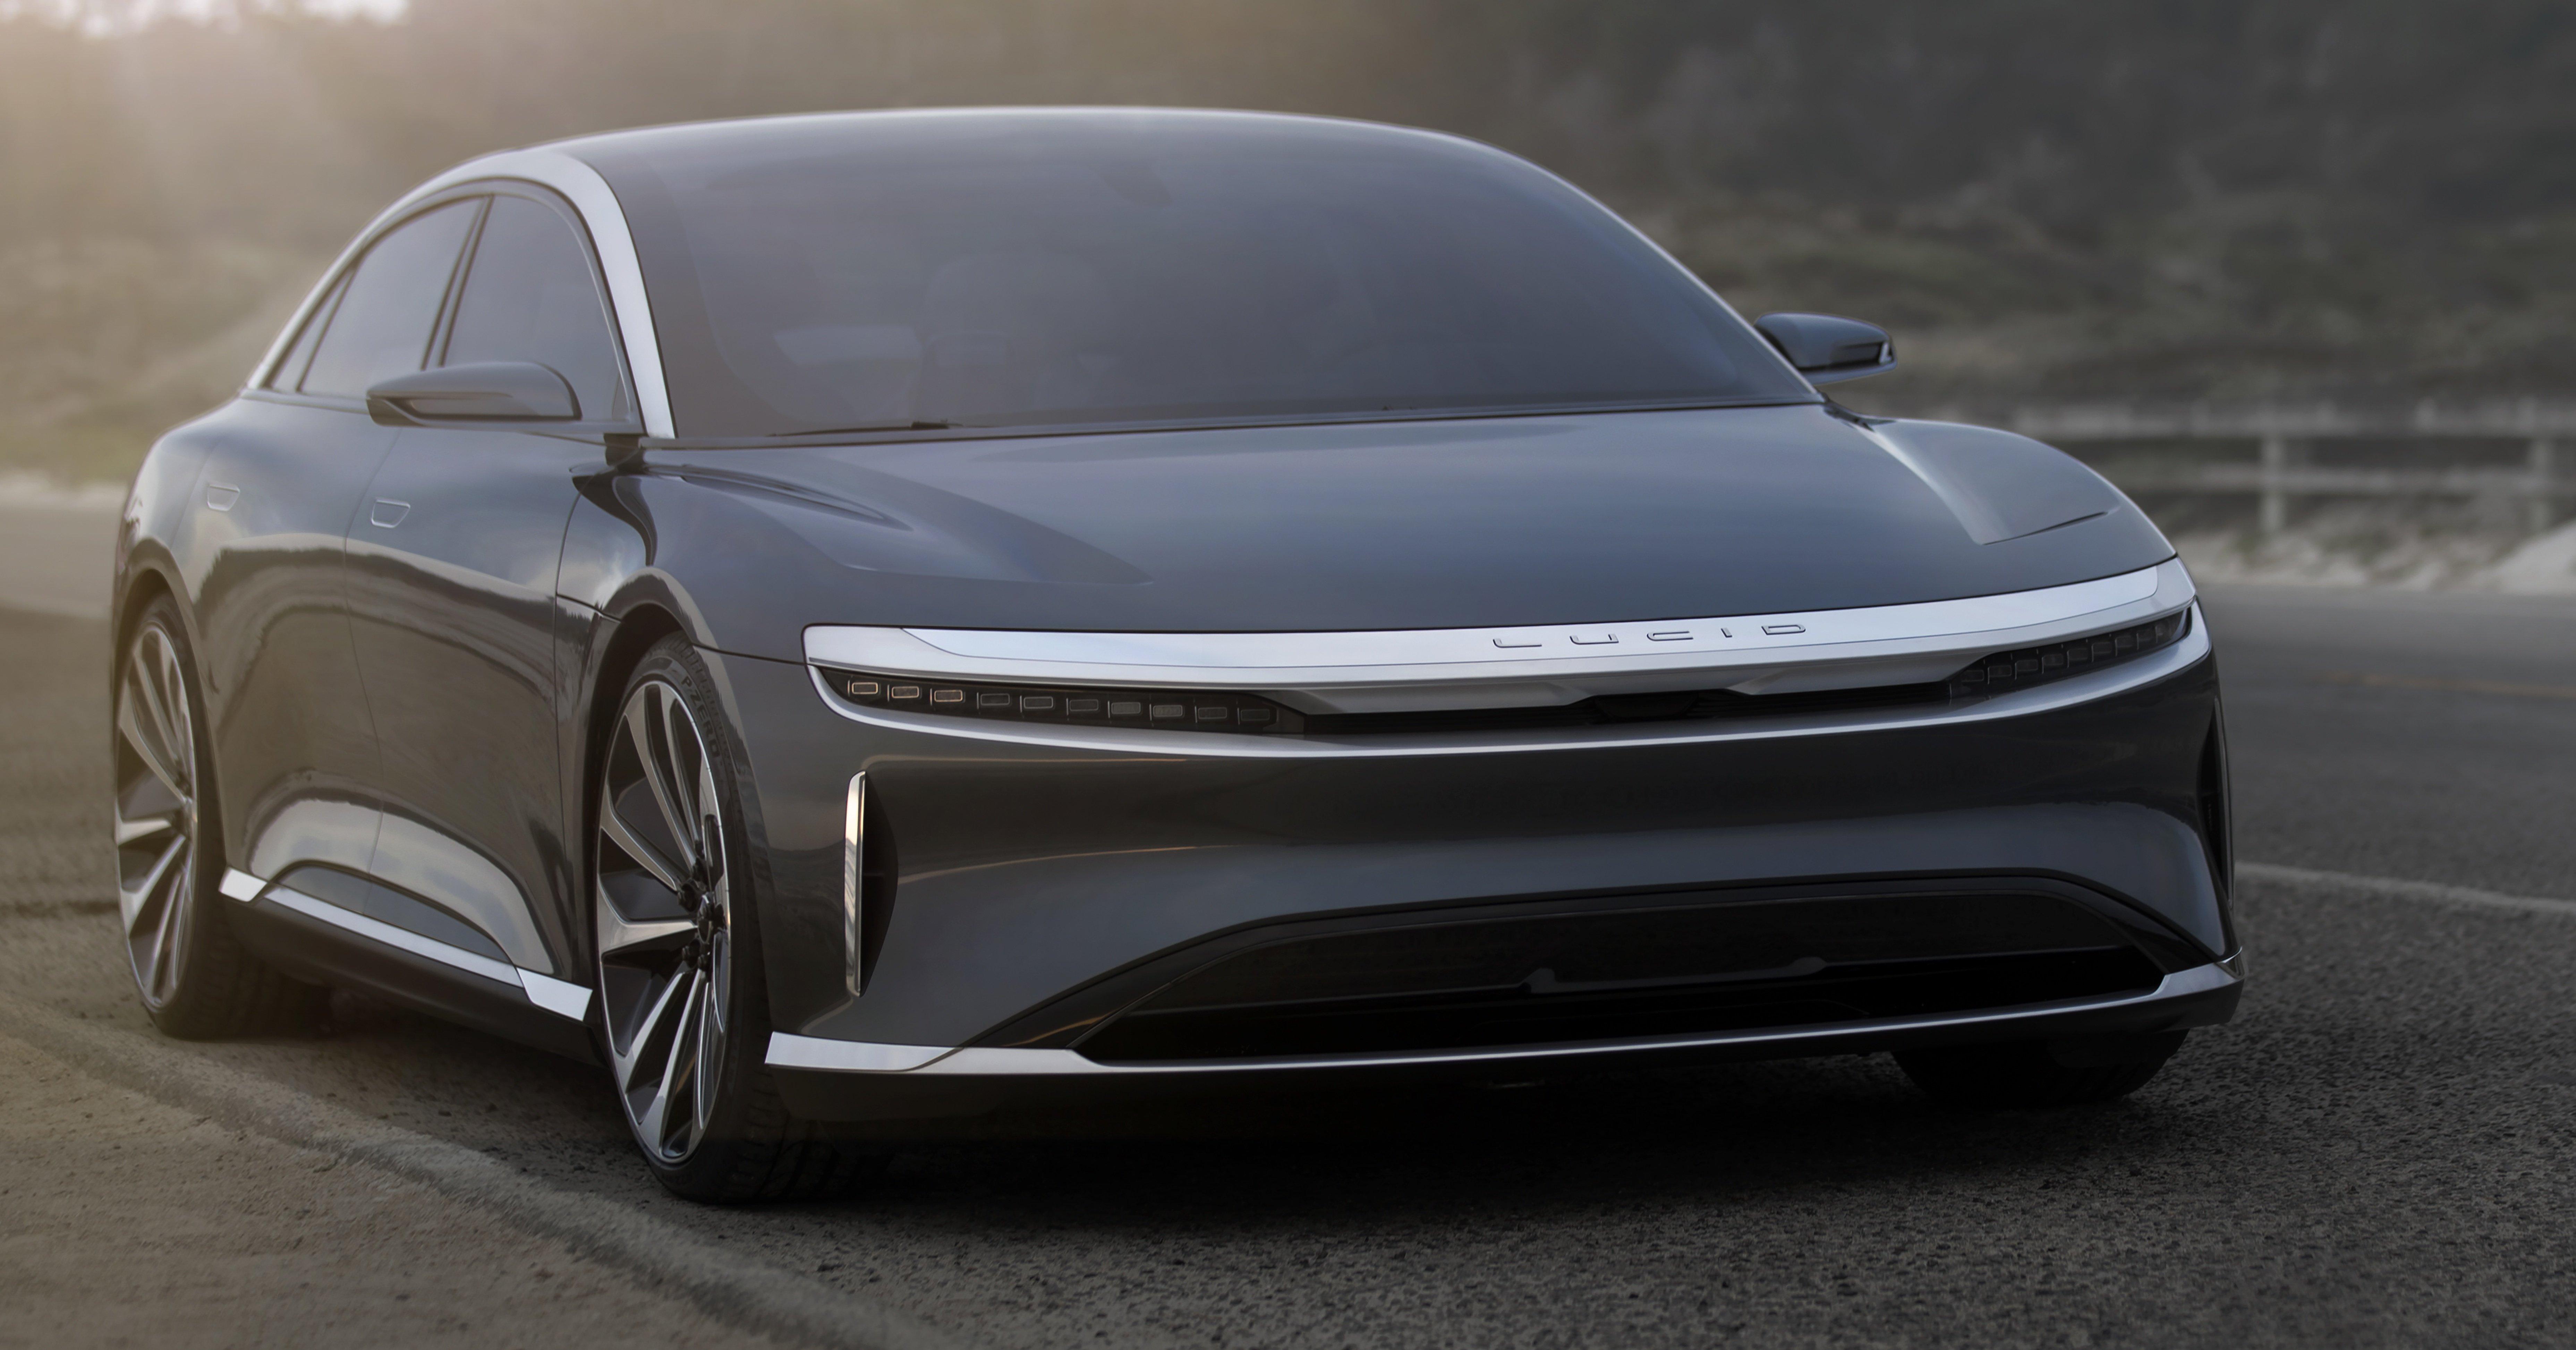 Lucid Air Electric Sedan Will Get All Wheel Drive Option